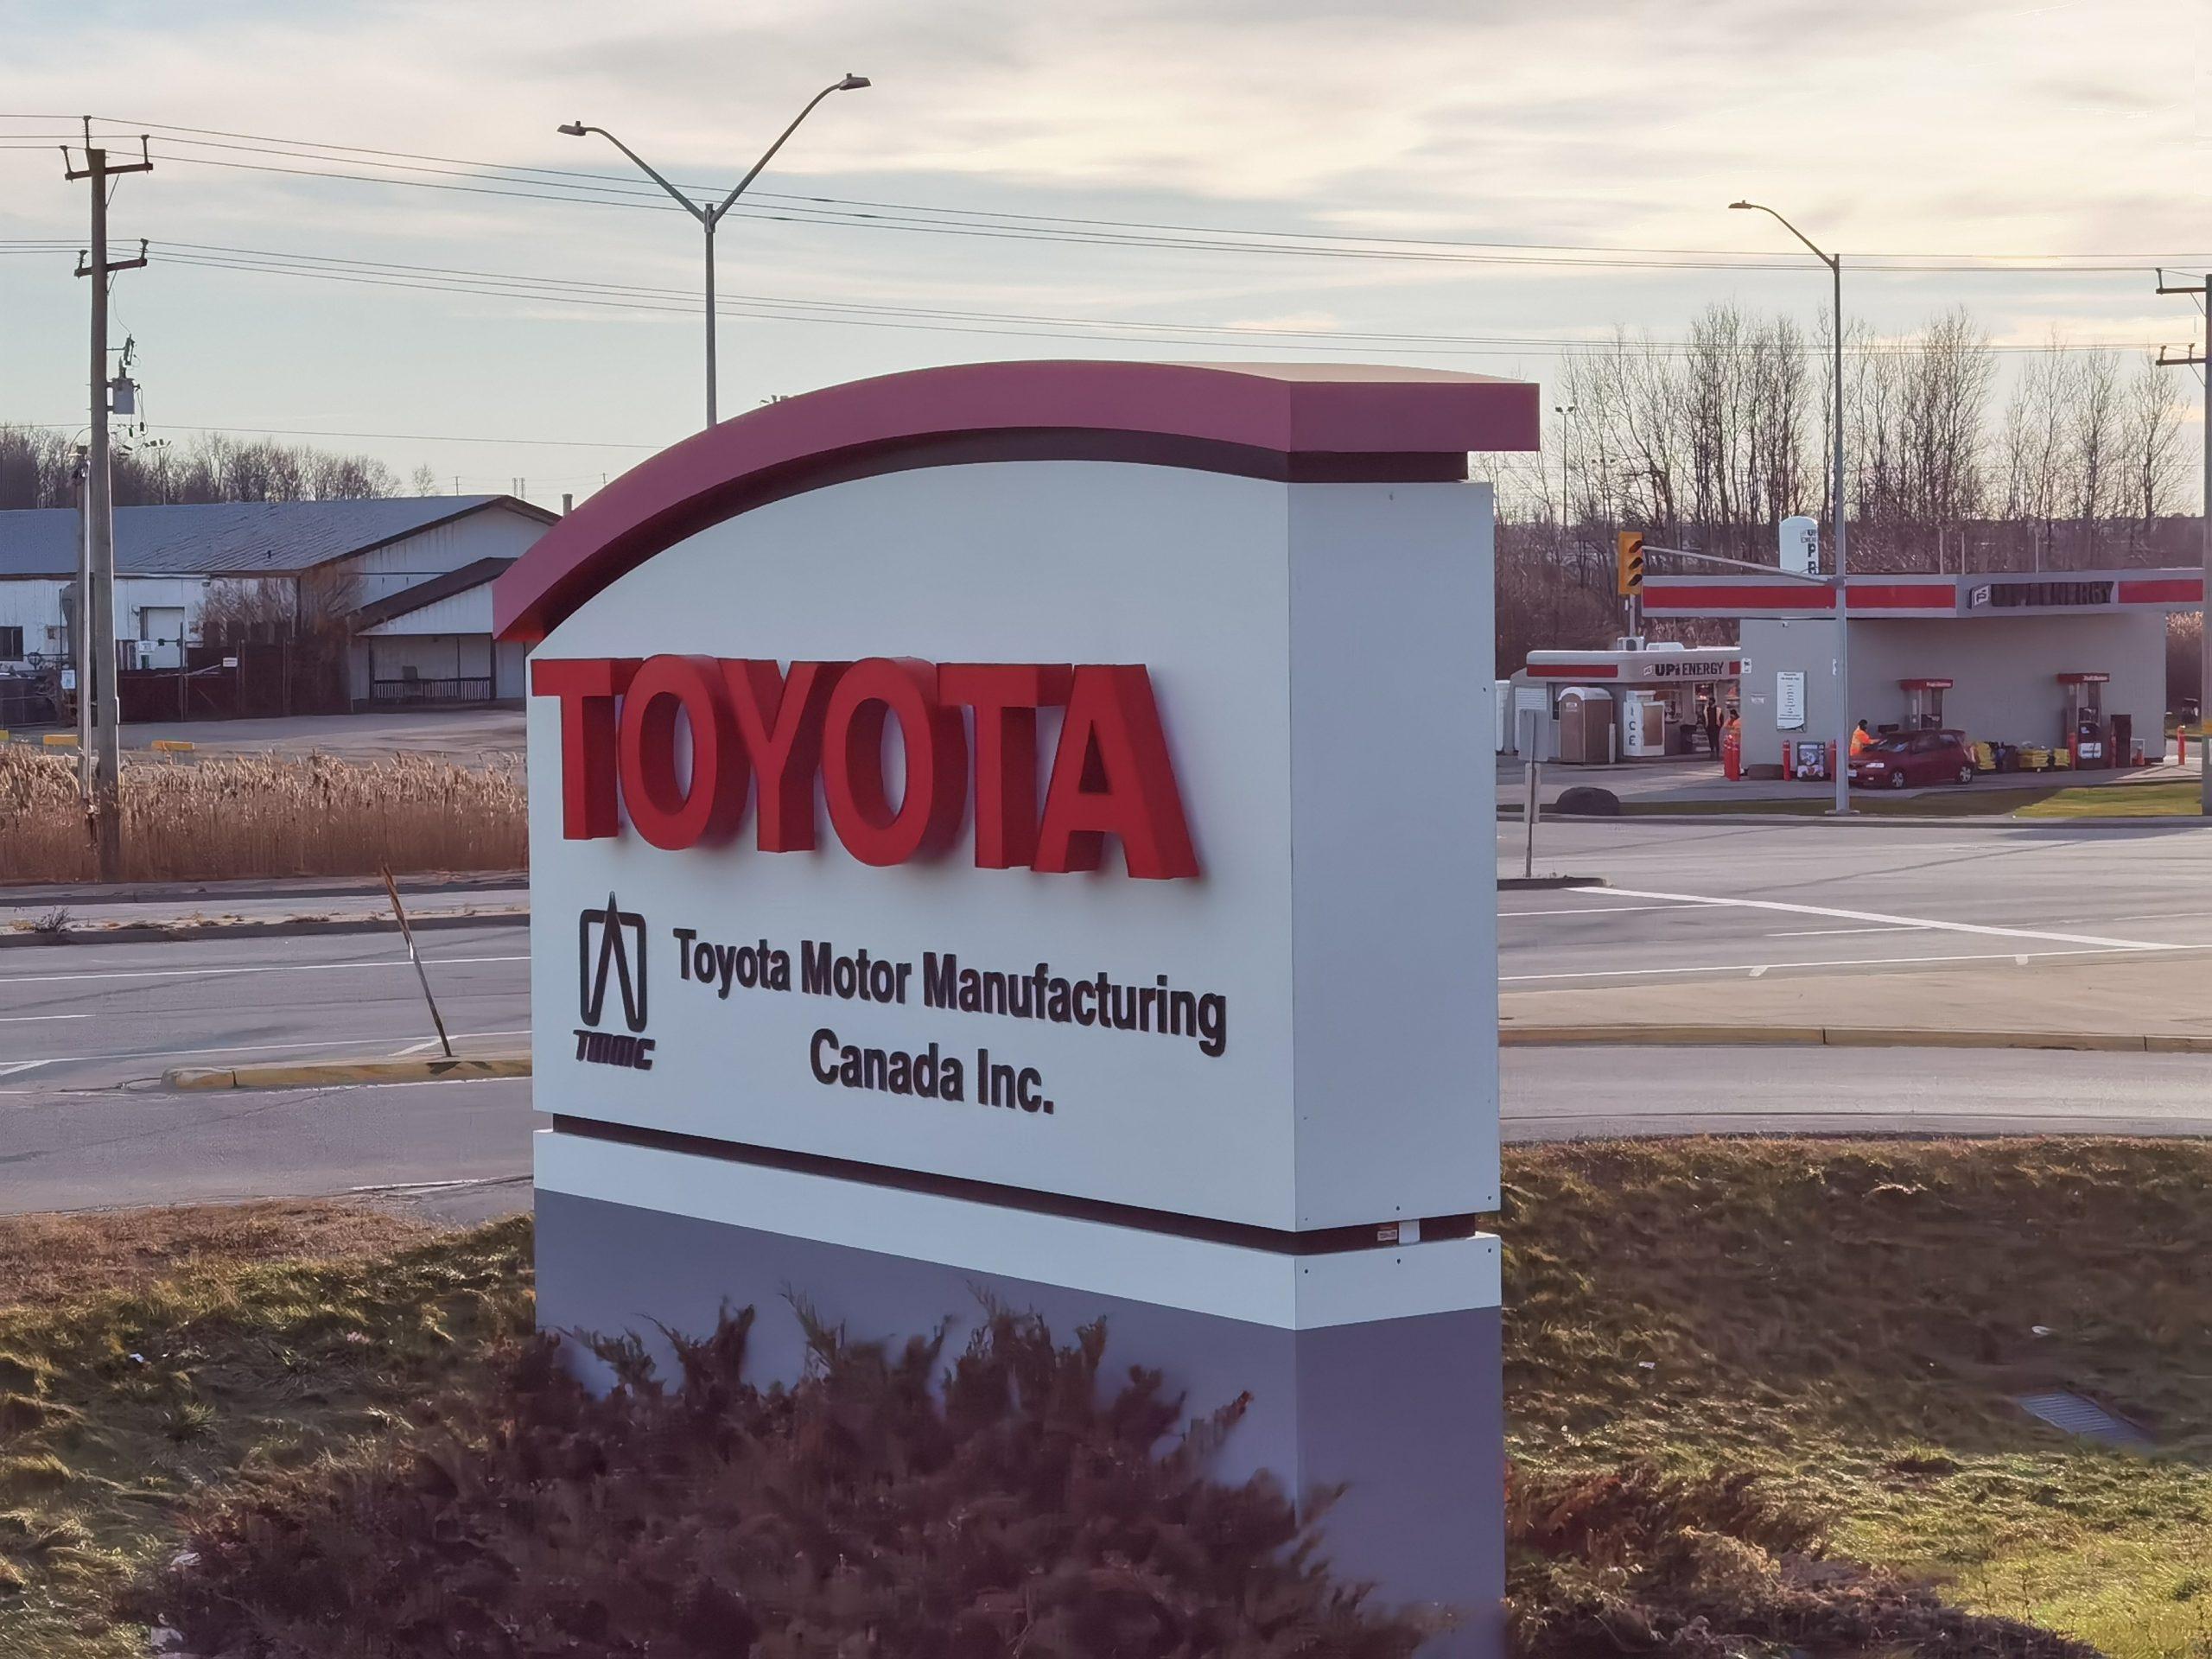 Toyota Motor Manufacturing Canada – Woodstock, Ontario, Canada [ONTARIO TRAVEL SERIES]